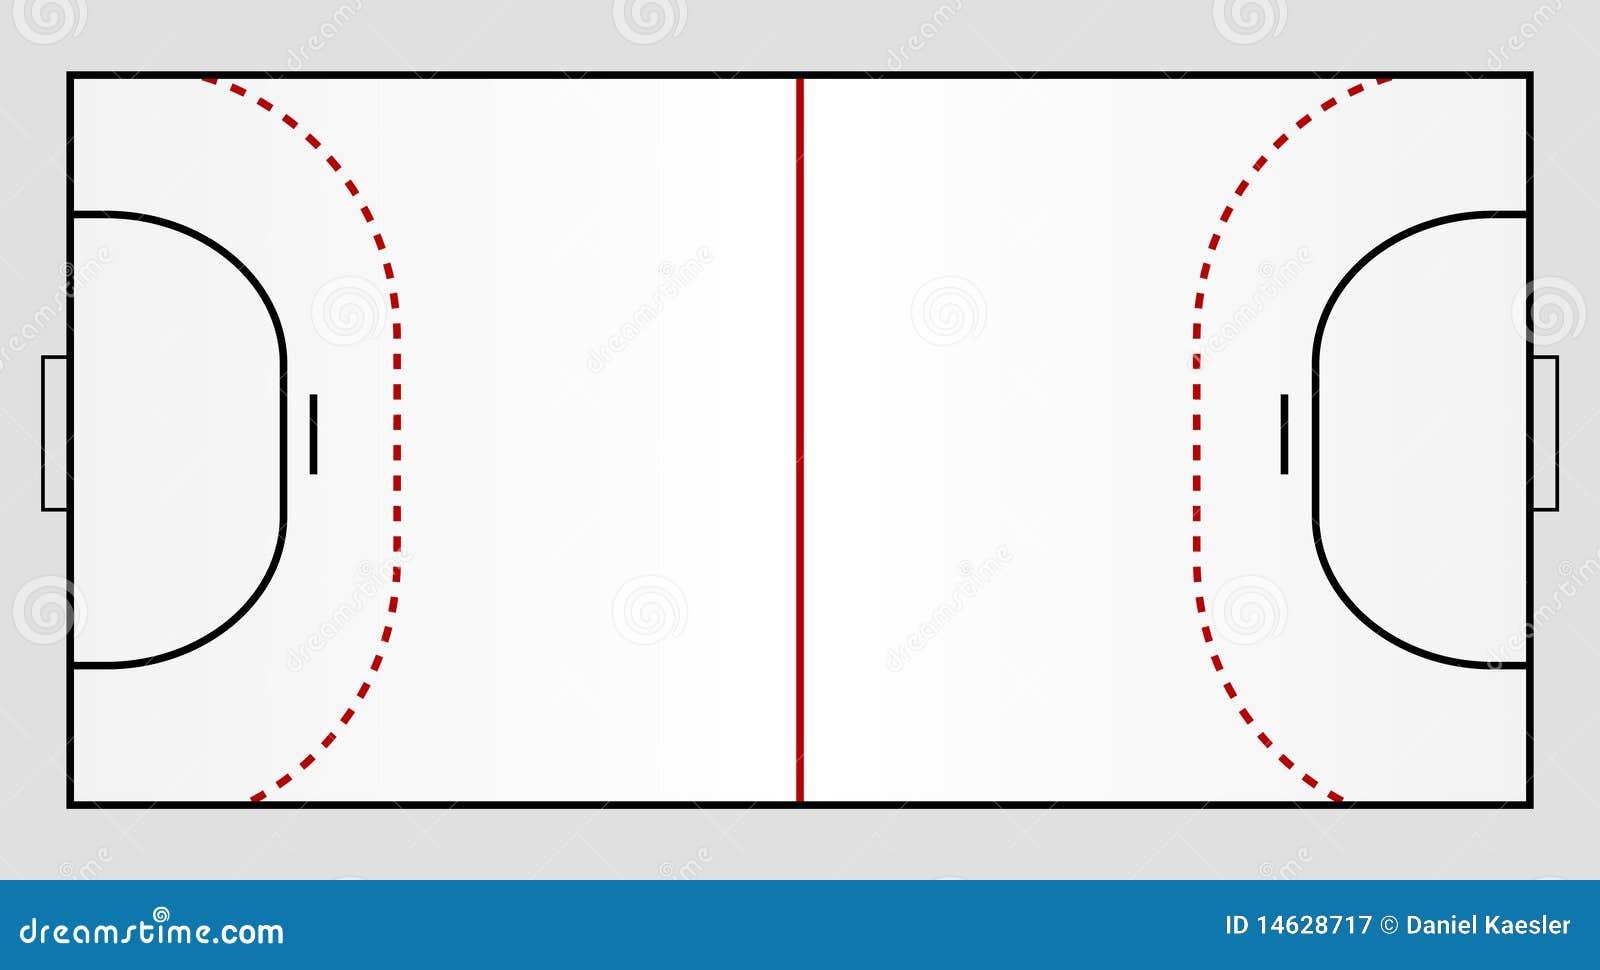 Handball Ground Royalty Free Stock Photography - Image: 14628717